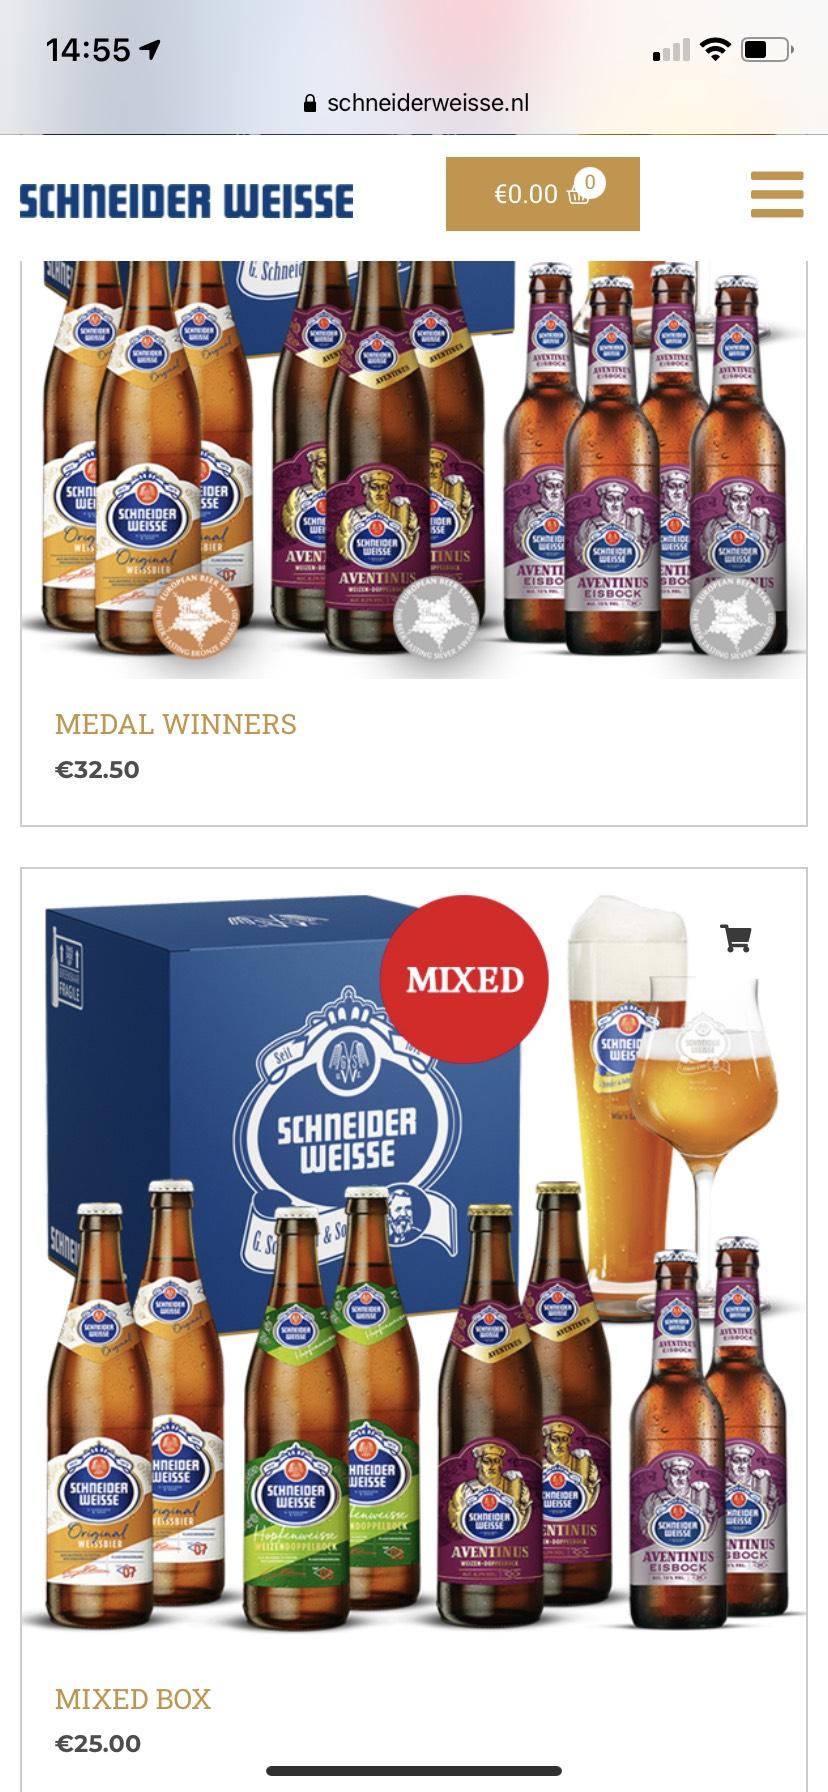 5 euro korting op bier van Schneider Weisse